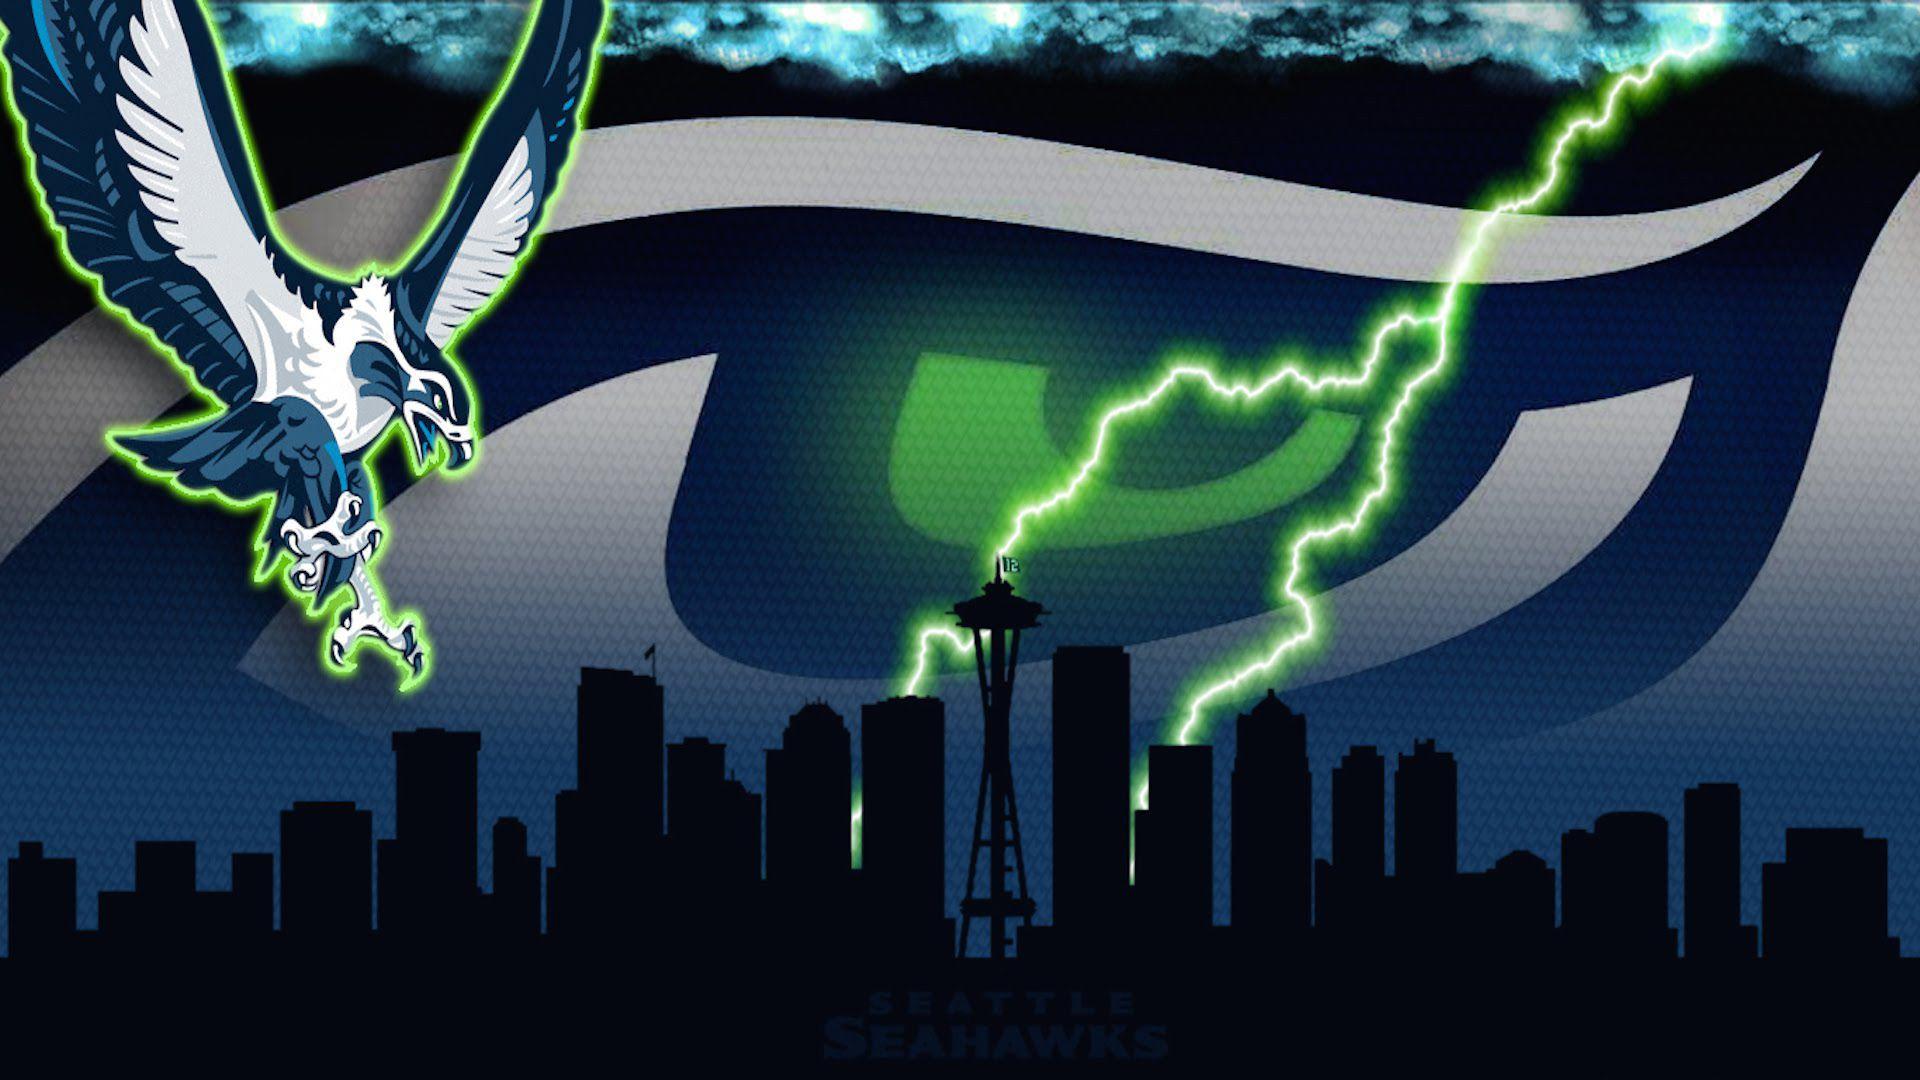 Seattle Seahawks wallpaper theme